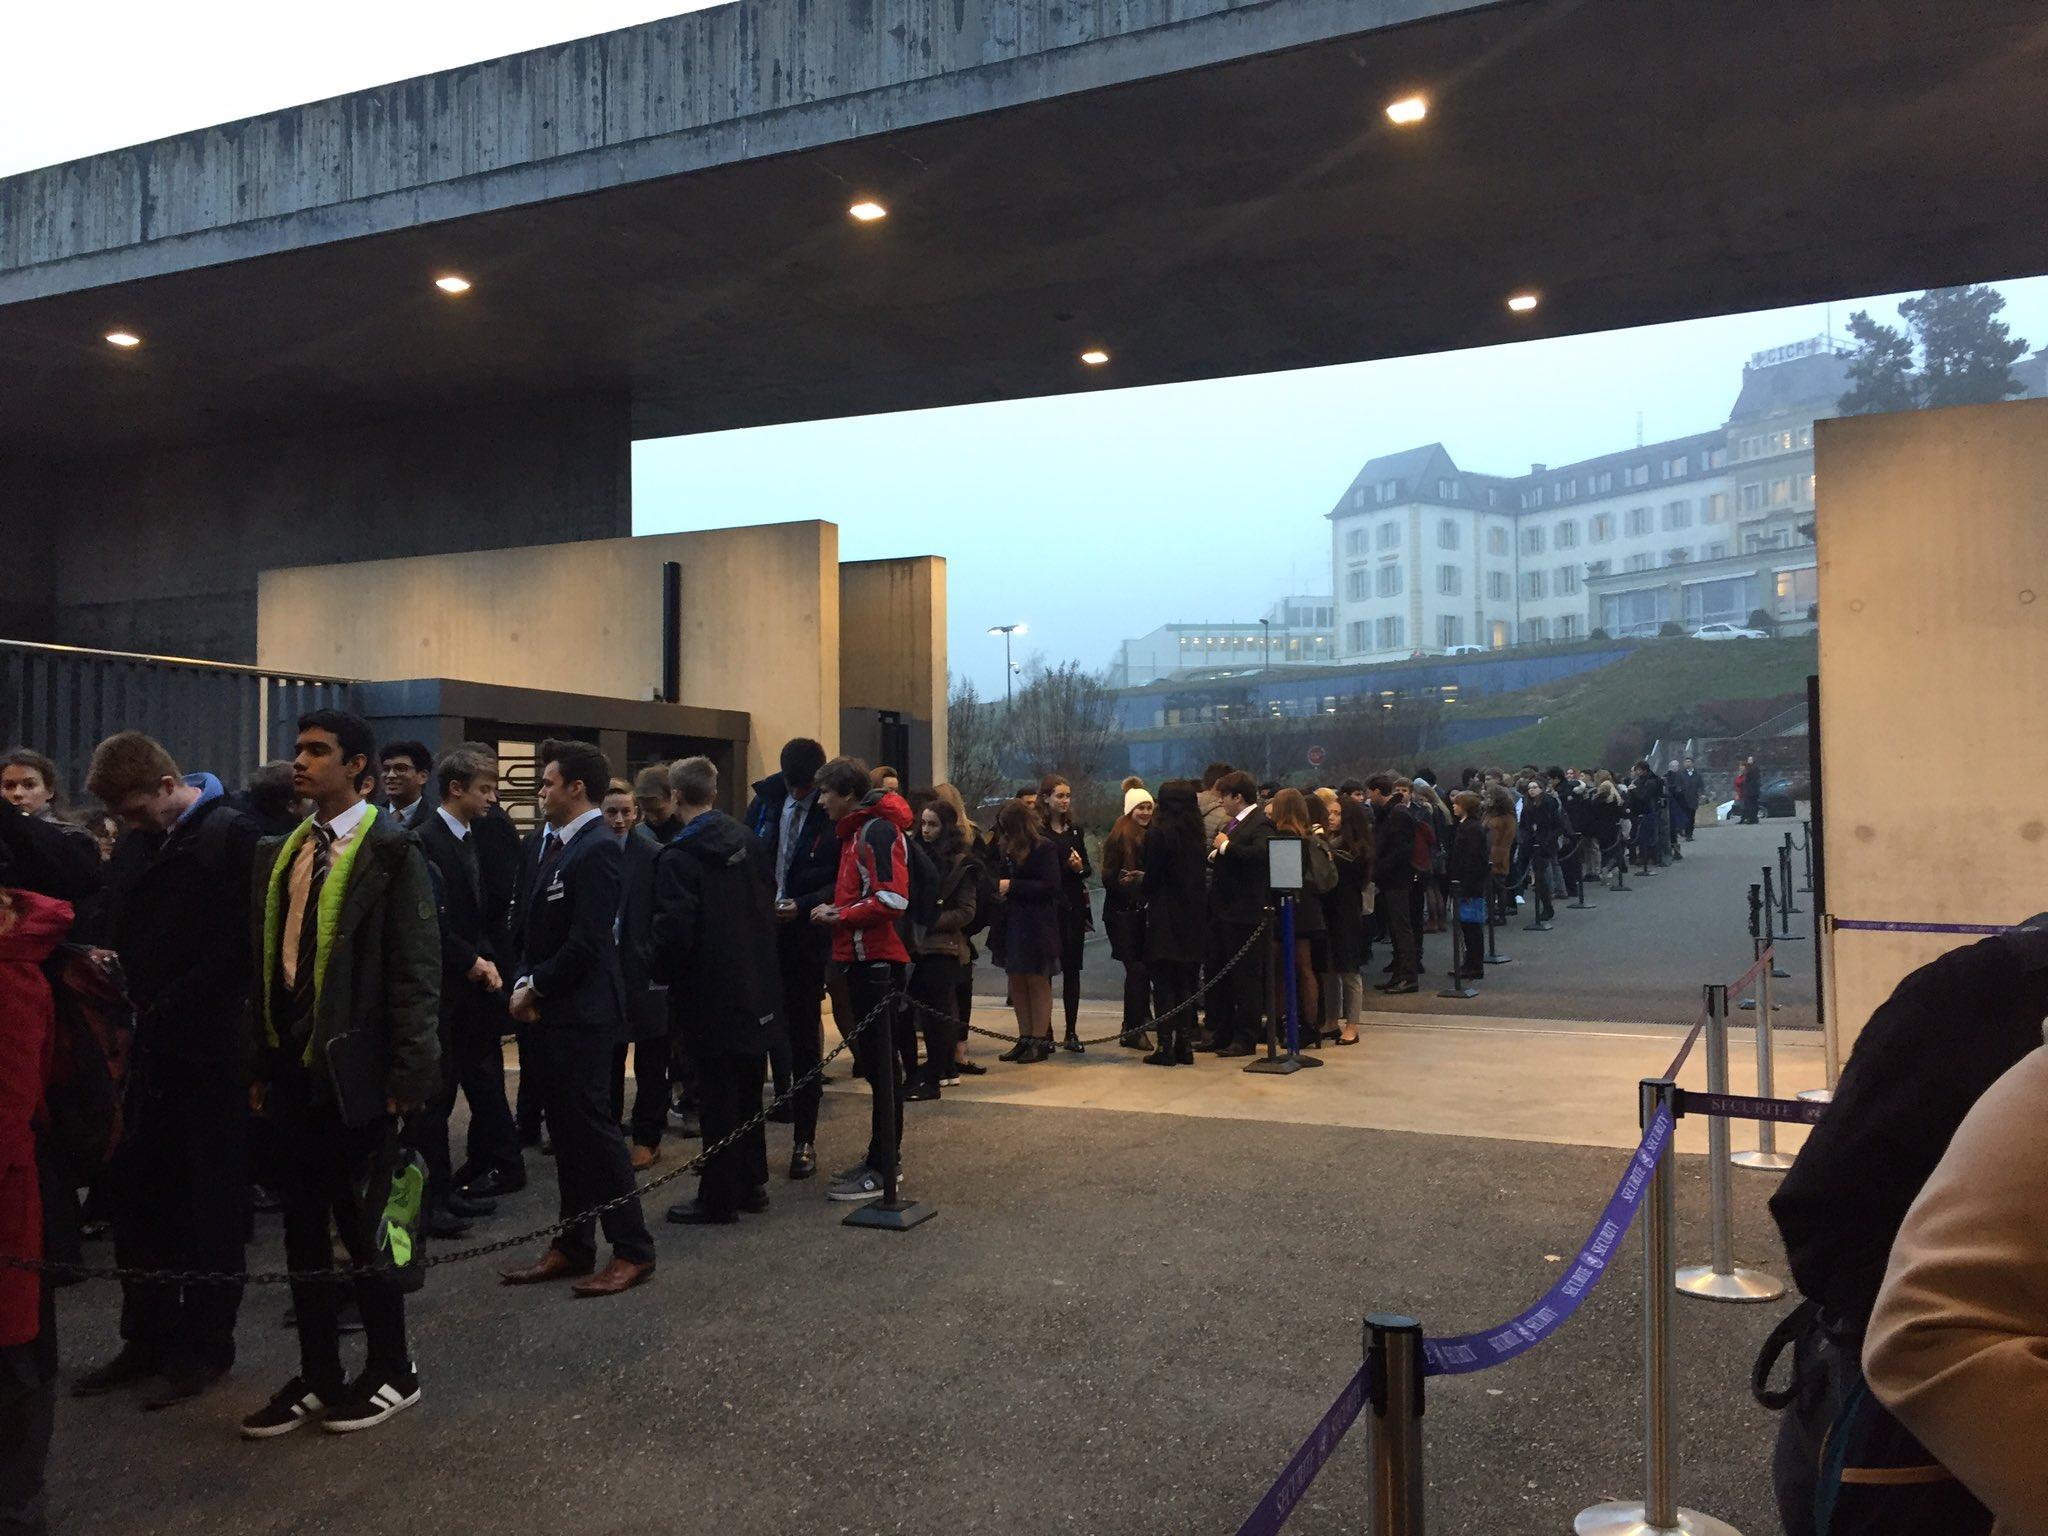 Longest line we have ever seen at @UNGeneva as students visiting today. @UN_Disarmament @UNOG_DG https://t.co/Pr3aDBYiQJ